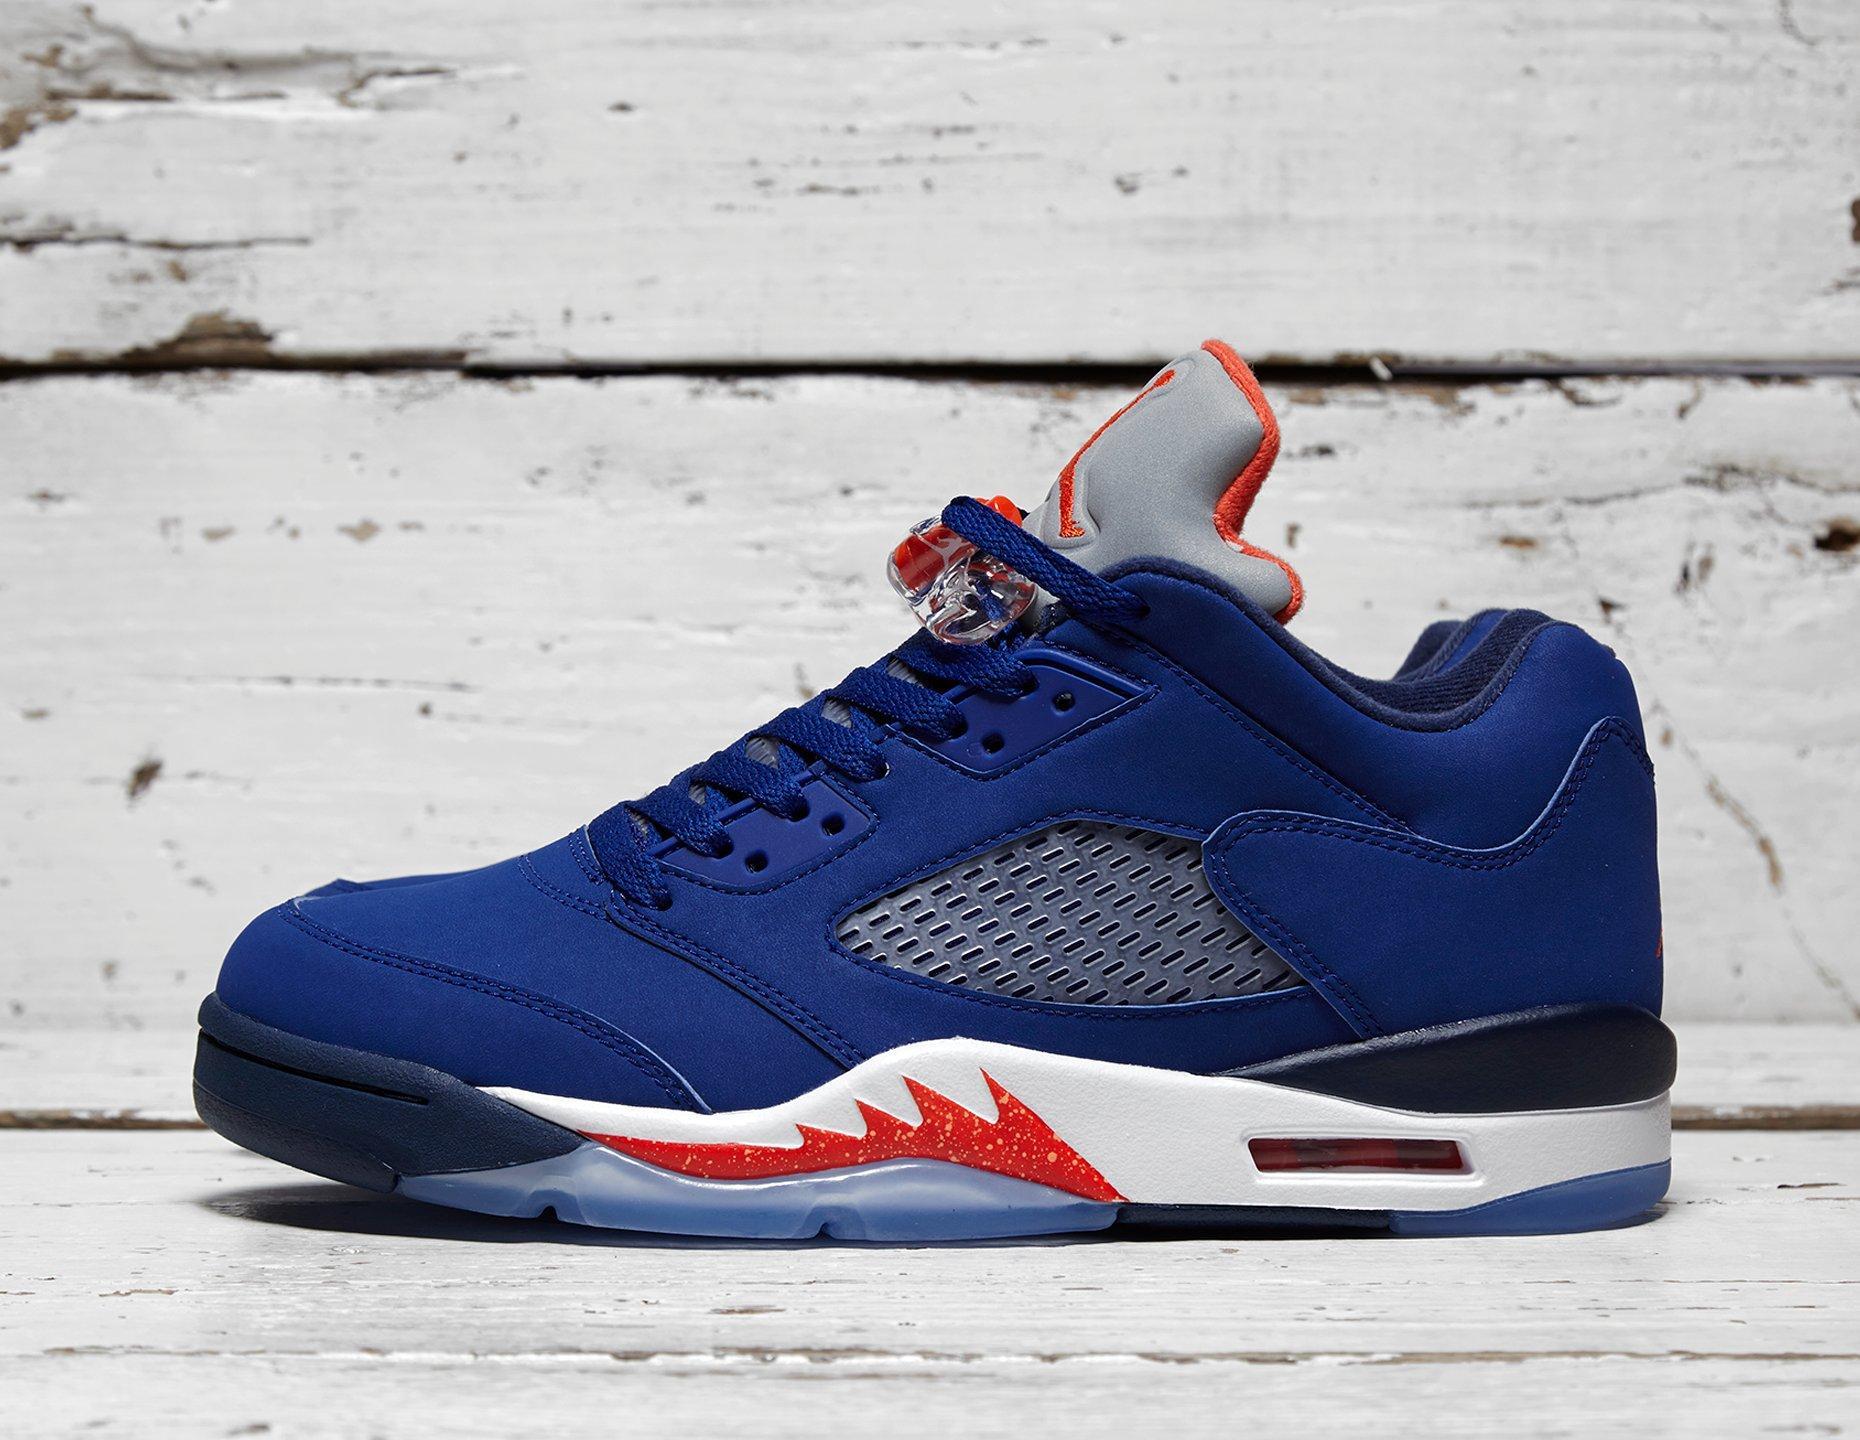 Mens Jordan 5 Low 'Knicks' - Blue/Orange/White, Blue/Orange/White - photo 1/1